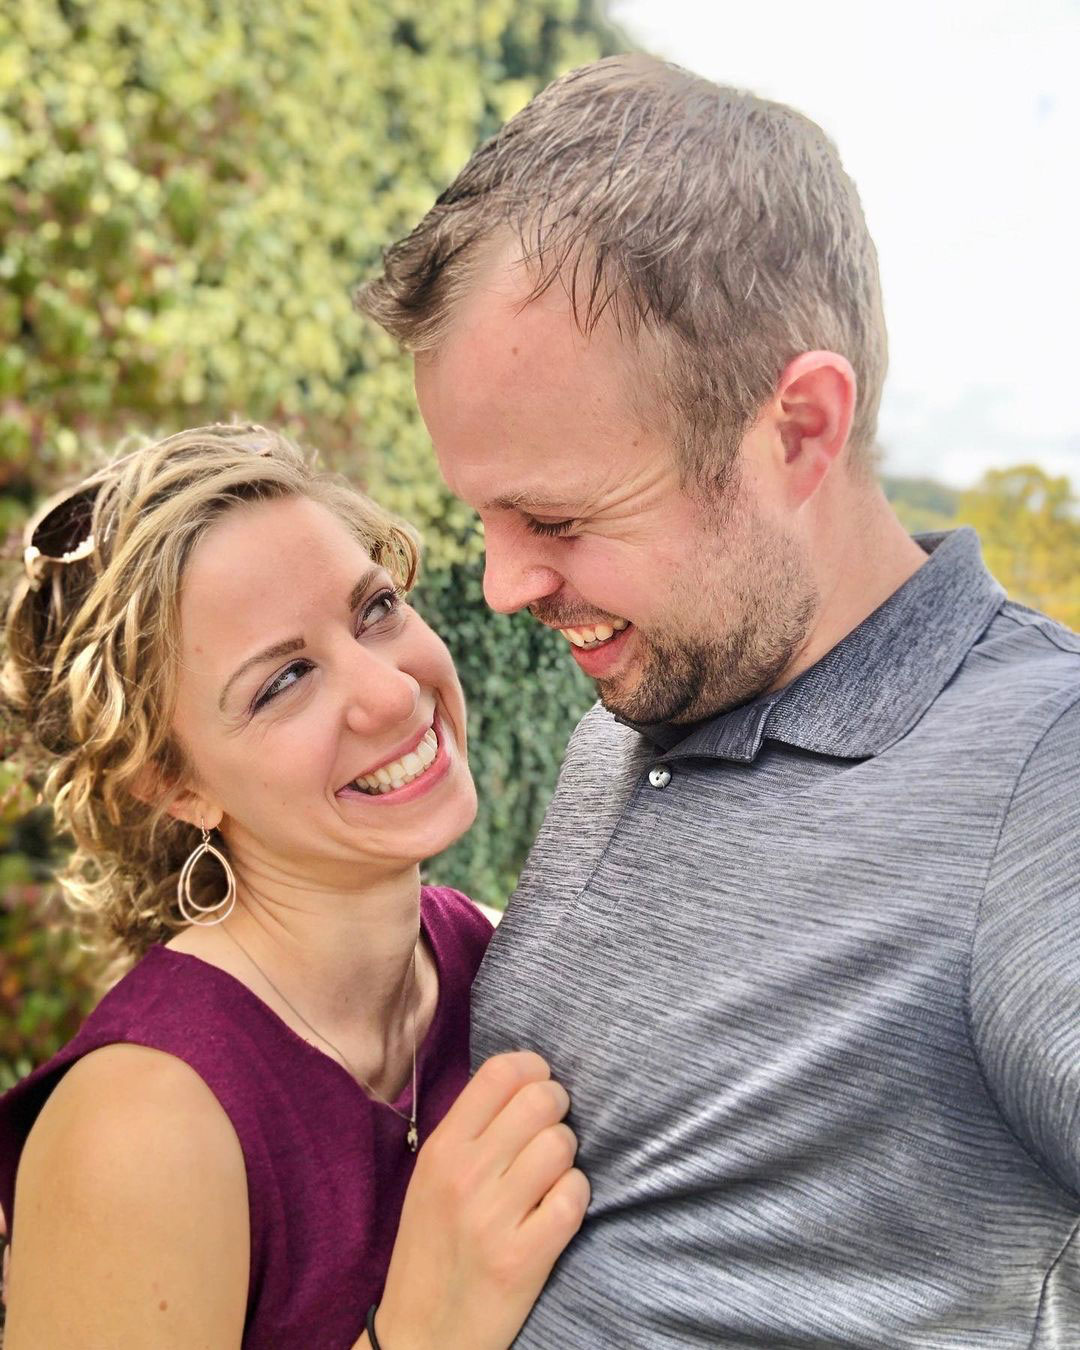 John David Duggar and Wife Abbie Look Smitten in PDA Photo Ahead of 2nd Wedding Anniversary